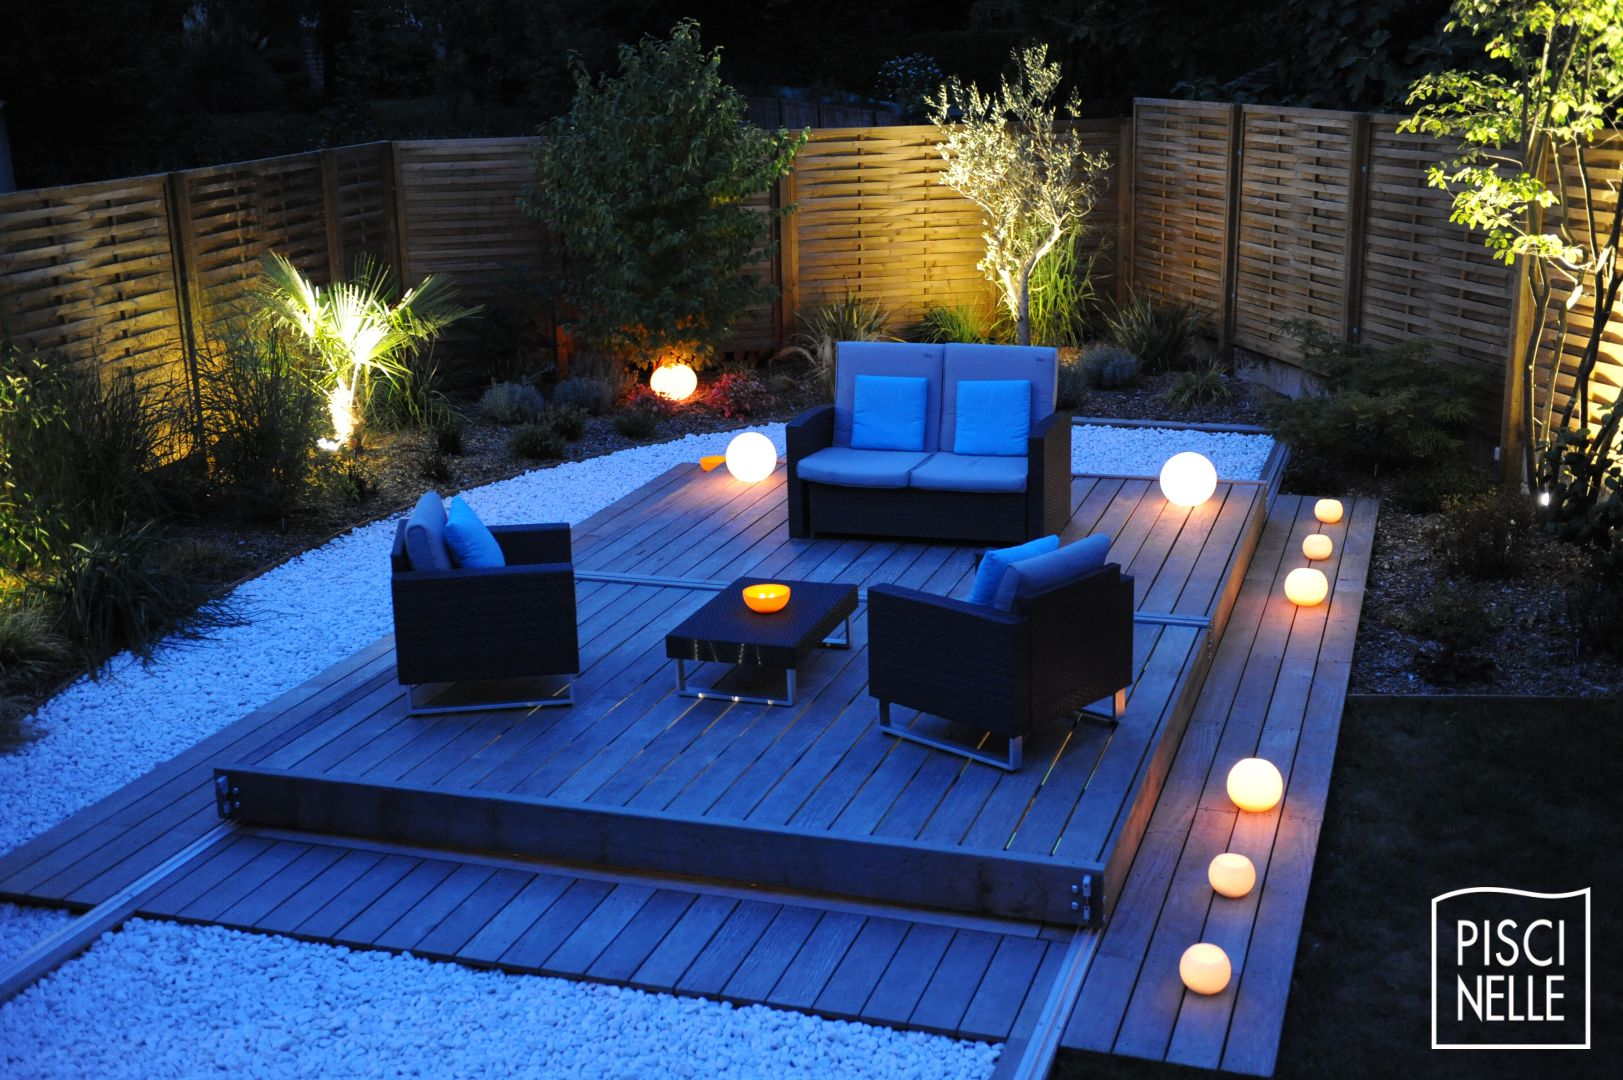 Une petite piscine de nuit avec terrasse mobile en 2 parties - Piscine et terrasse ...